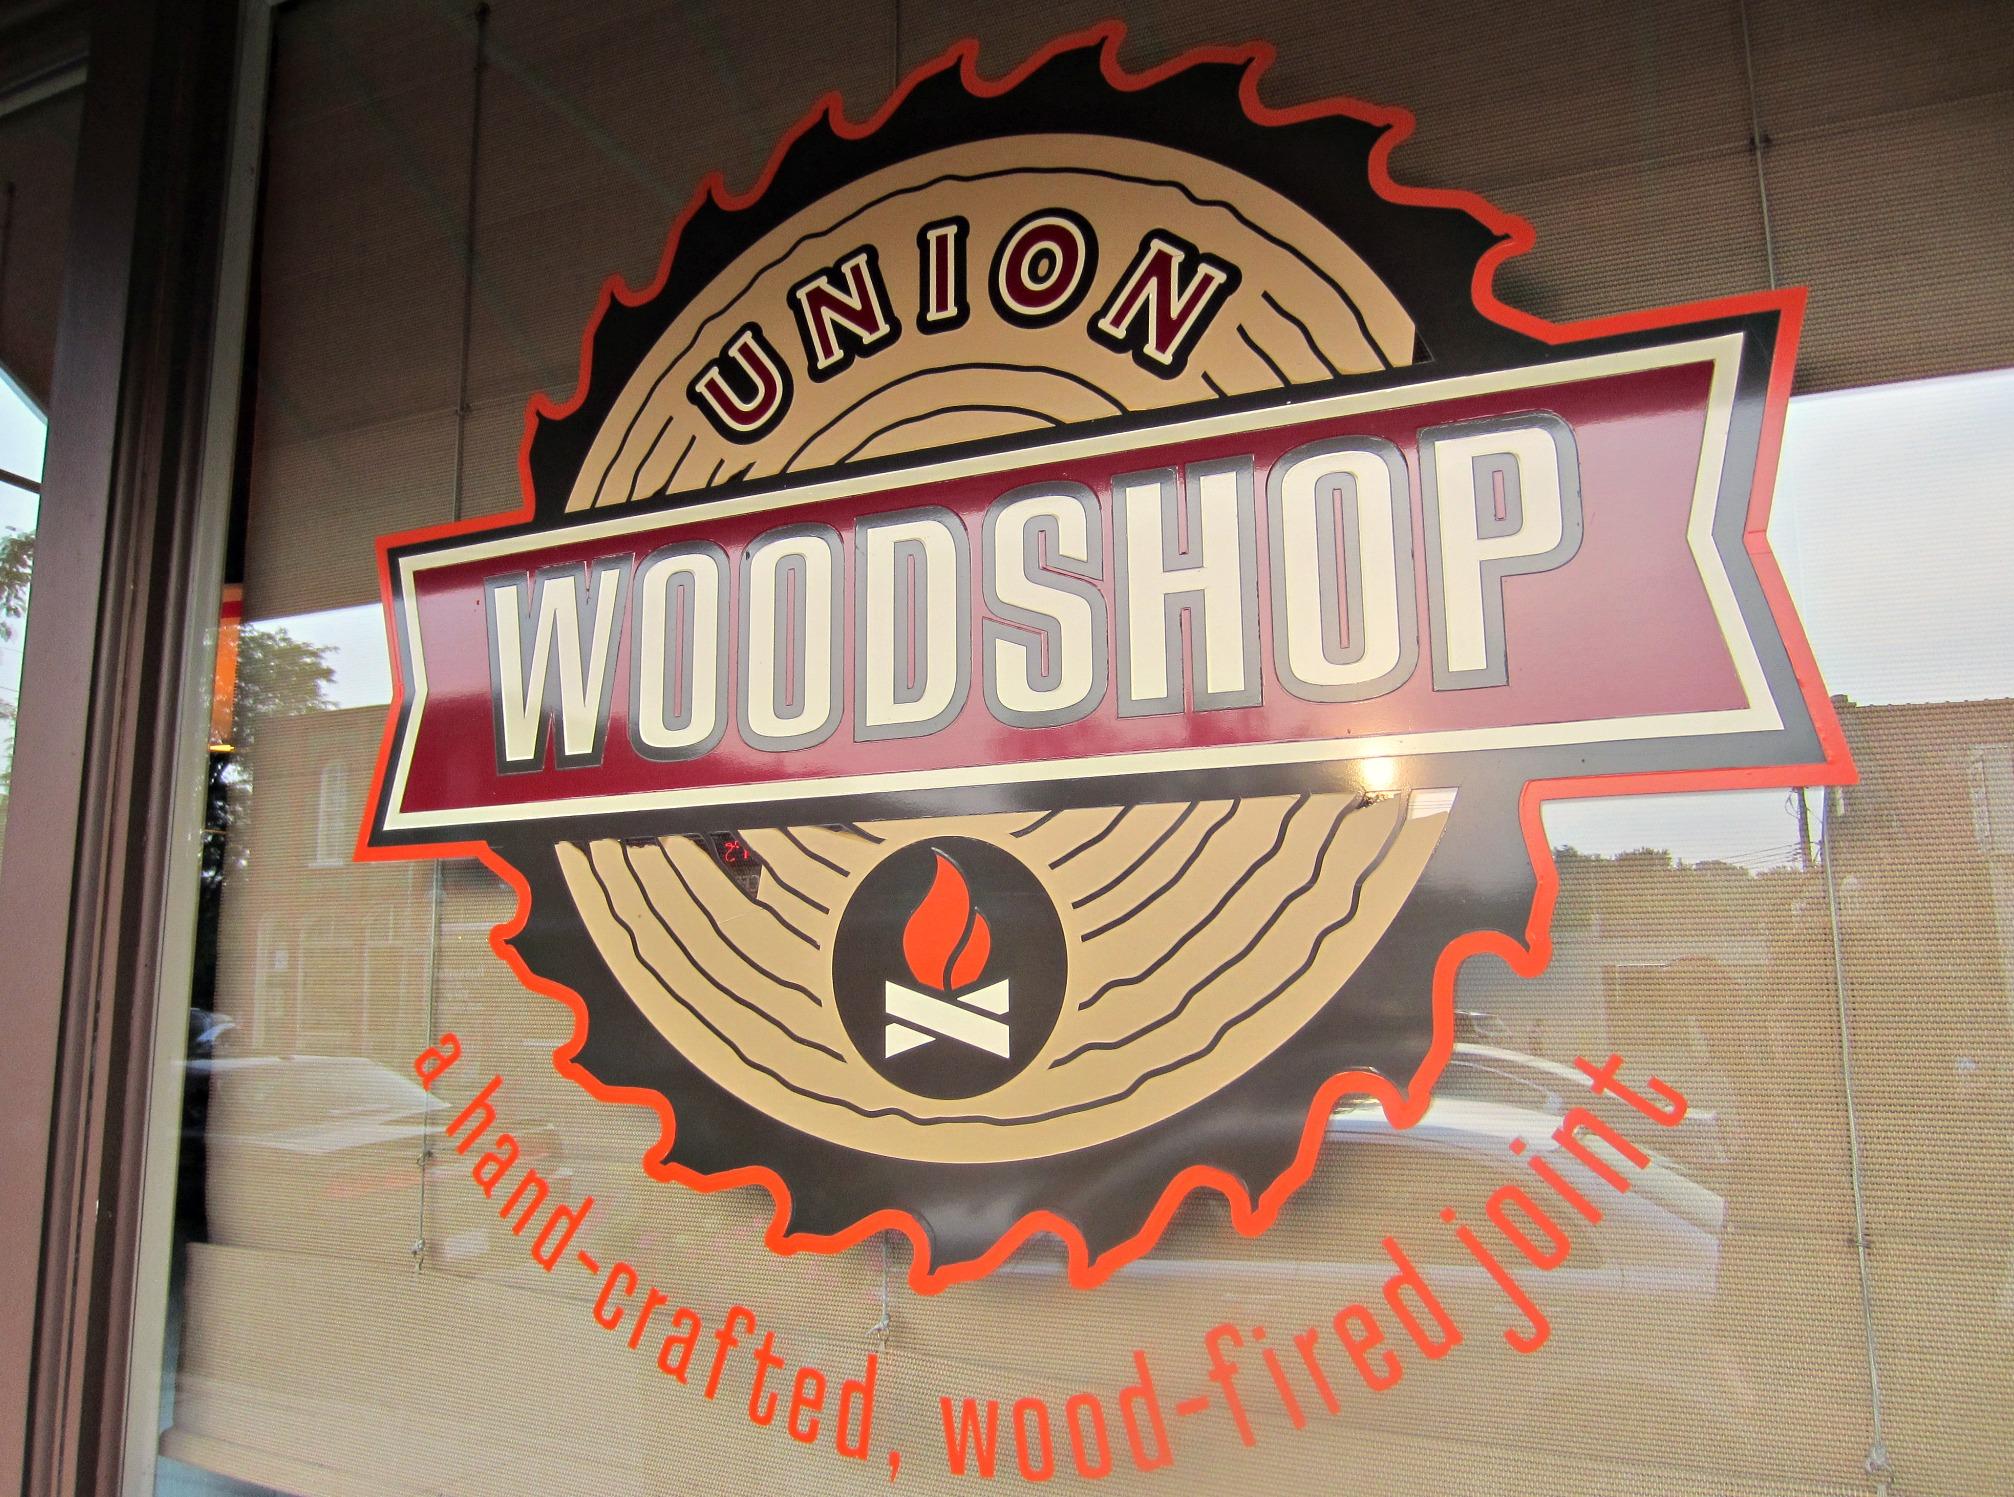 Union Woodshop Clarkston Restaurant